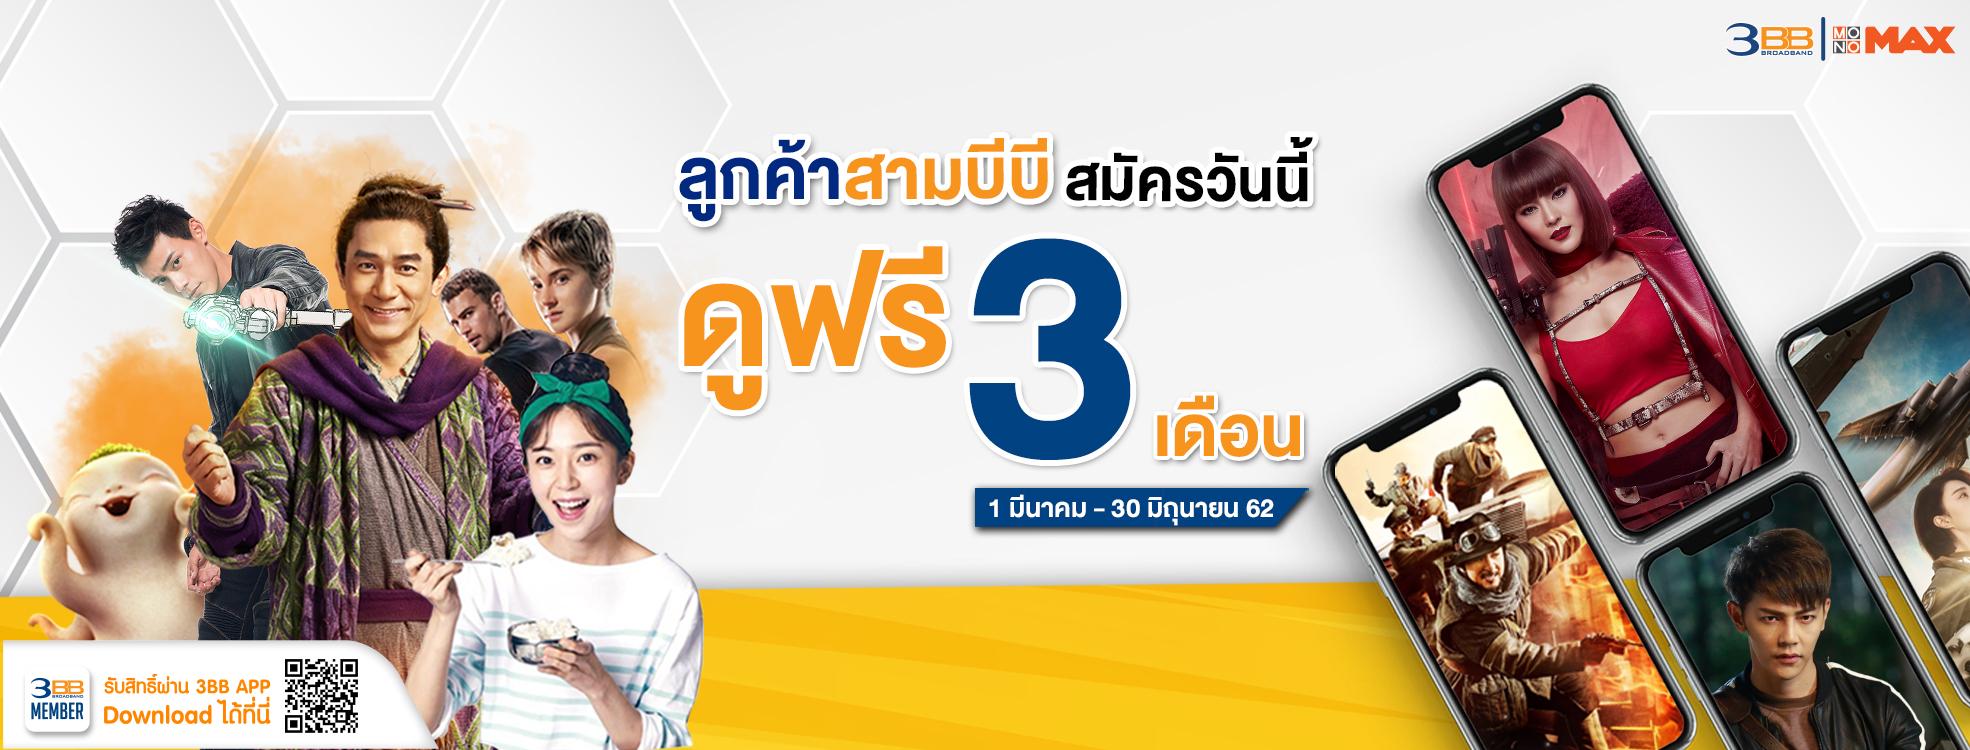 250 baht Free 3 Month